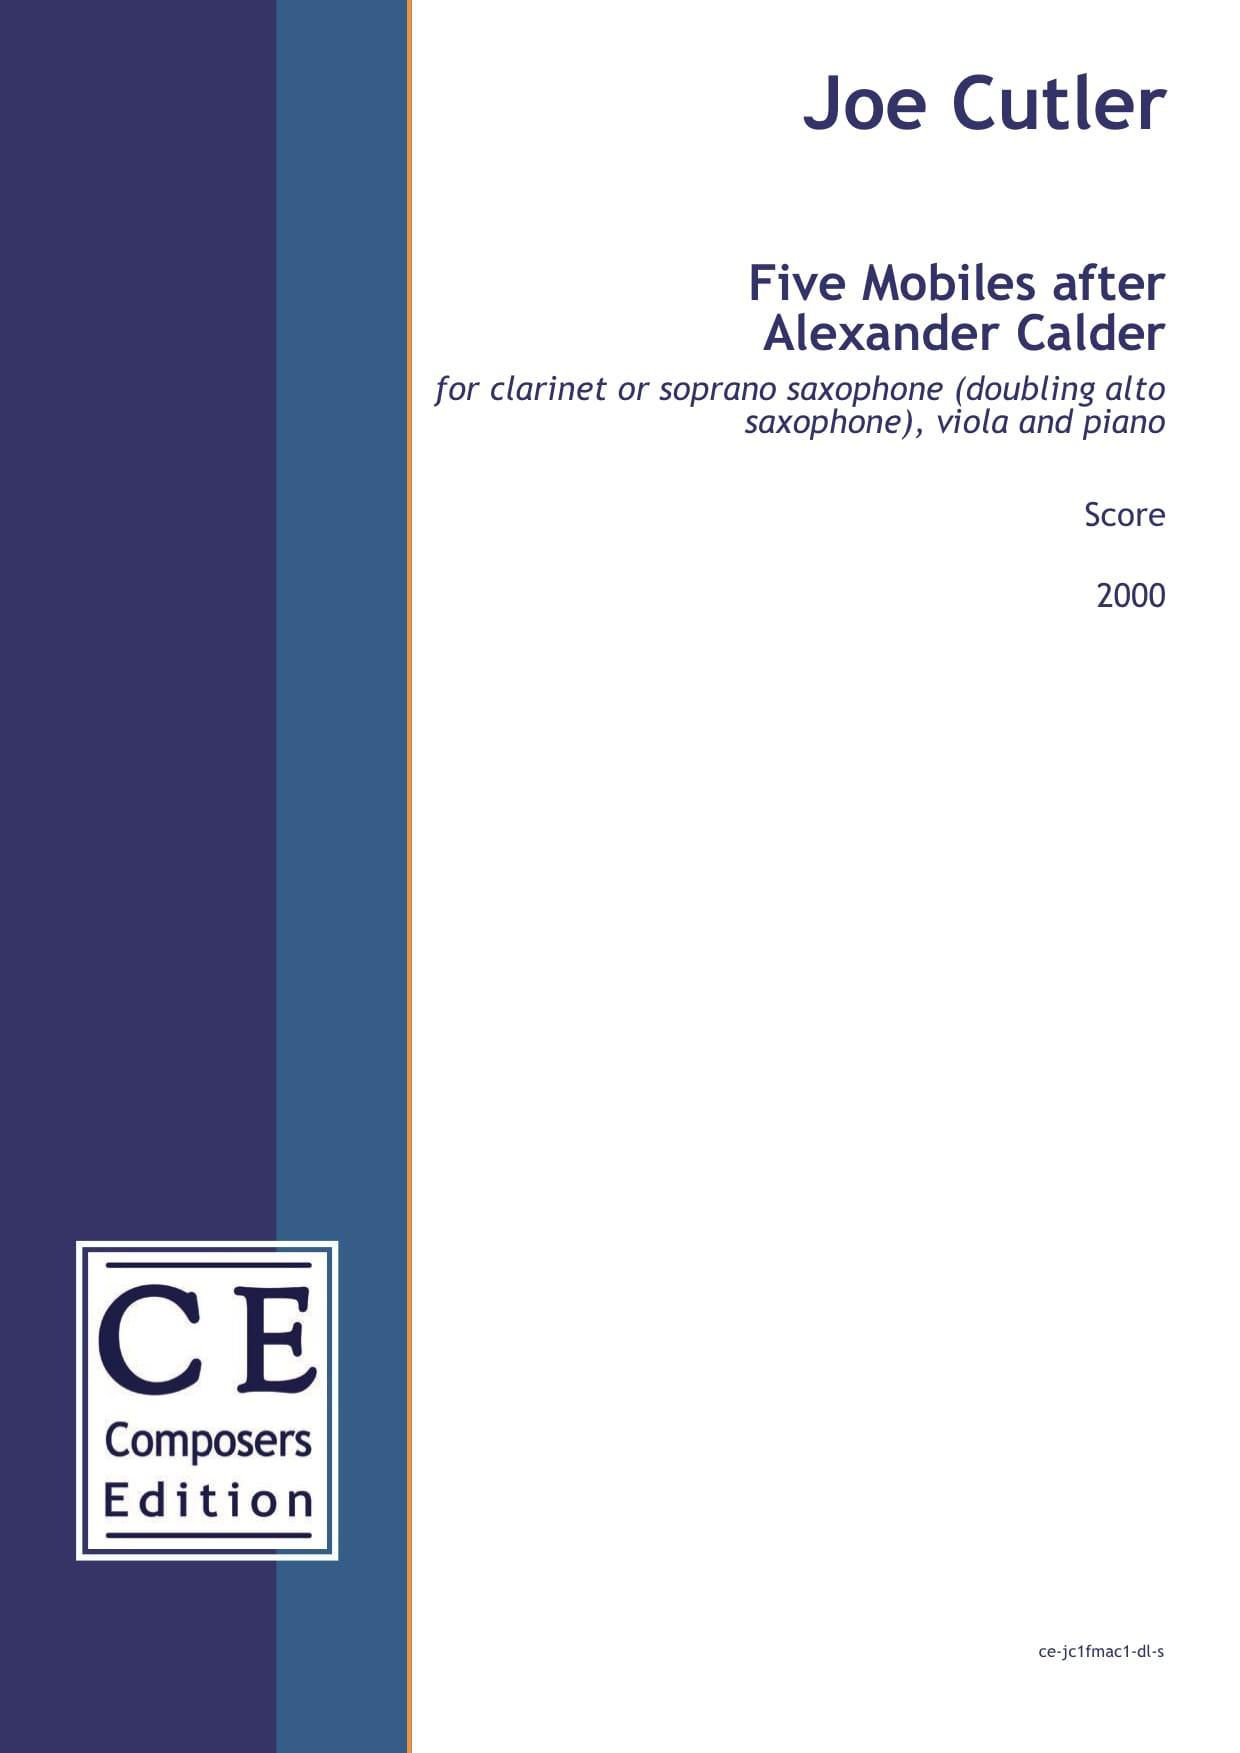 Joe Cutler: Five Mobiles after Alexander Calder for clarinet or soprano saxophone (doubling alto saxophone), viola and piano